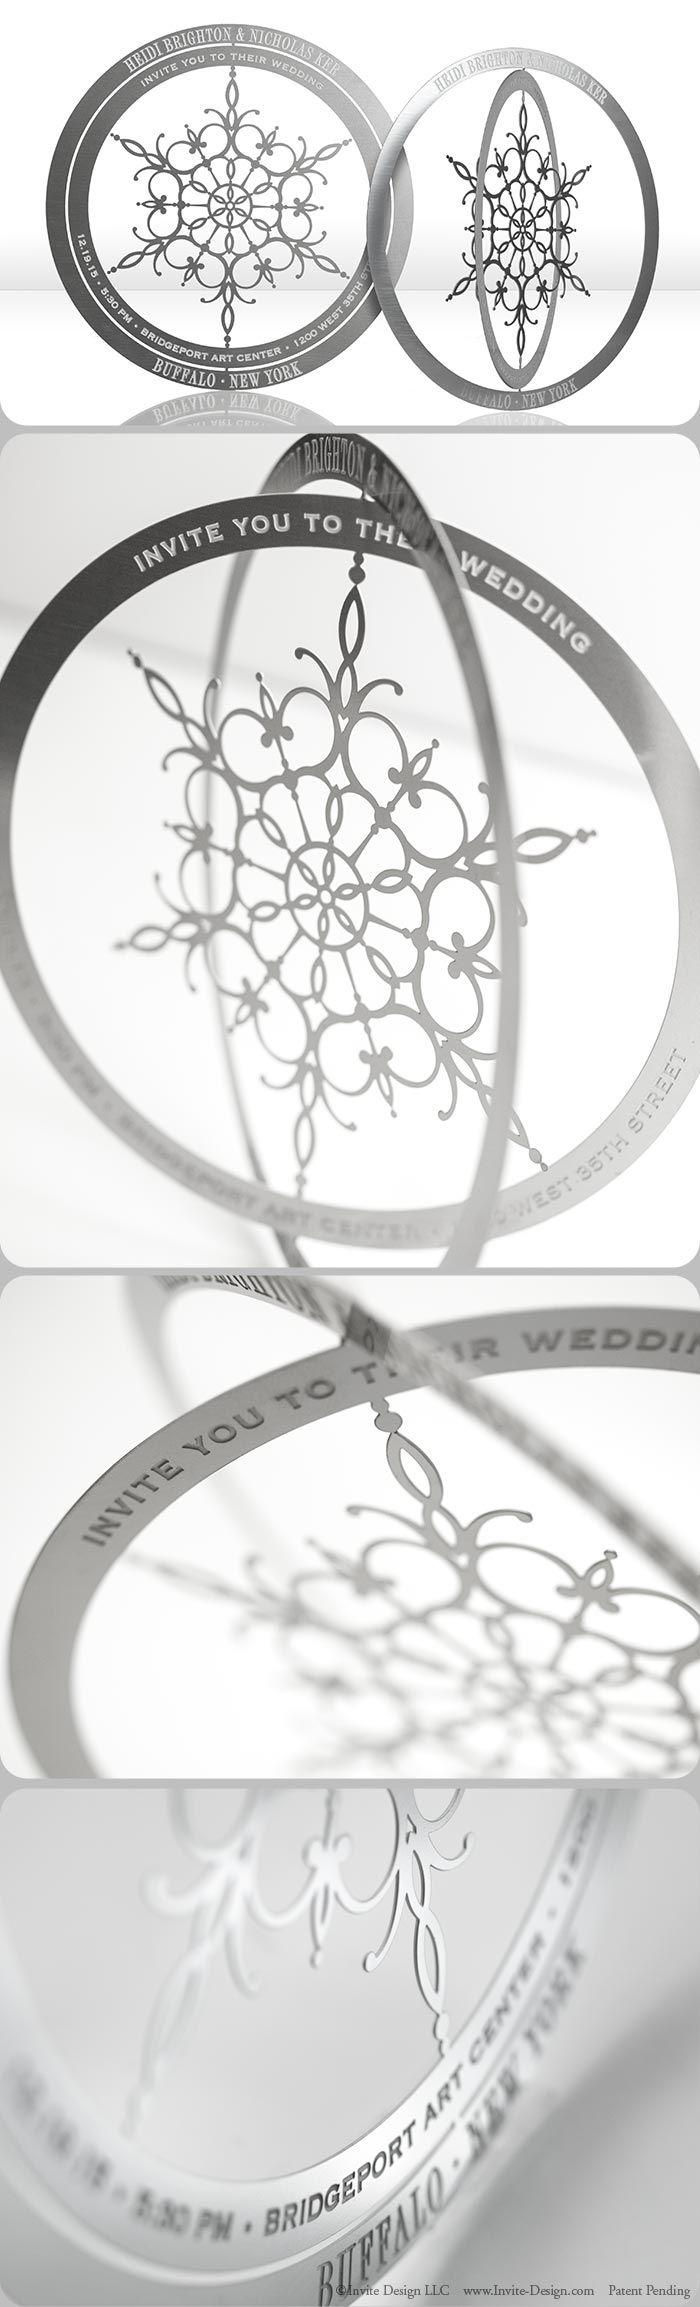 Snowflake metal wedding invitations mail flat, then transform into ...